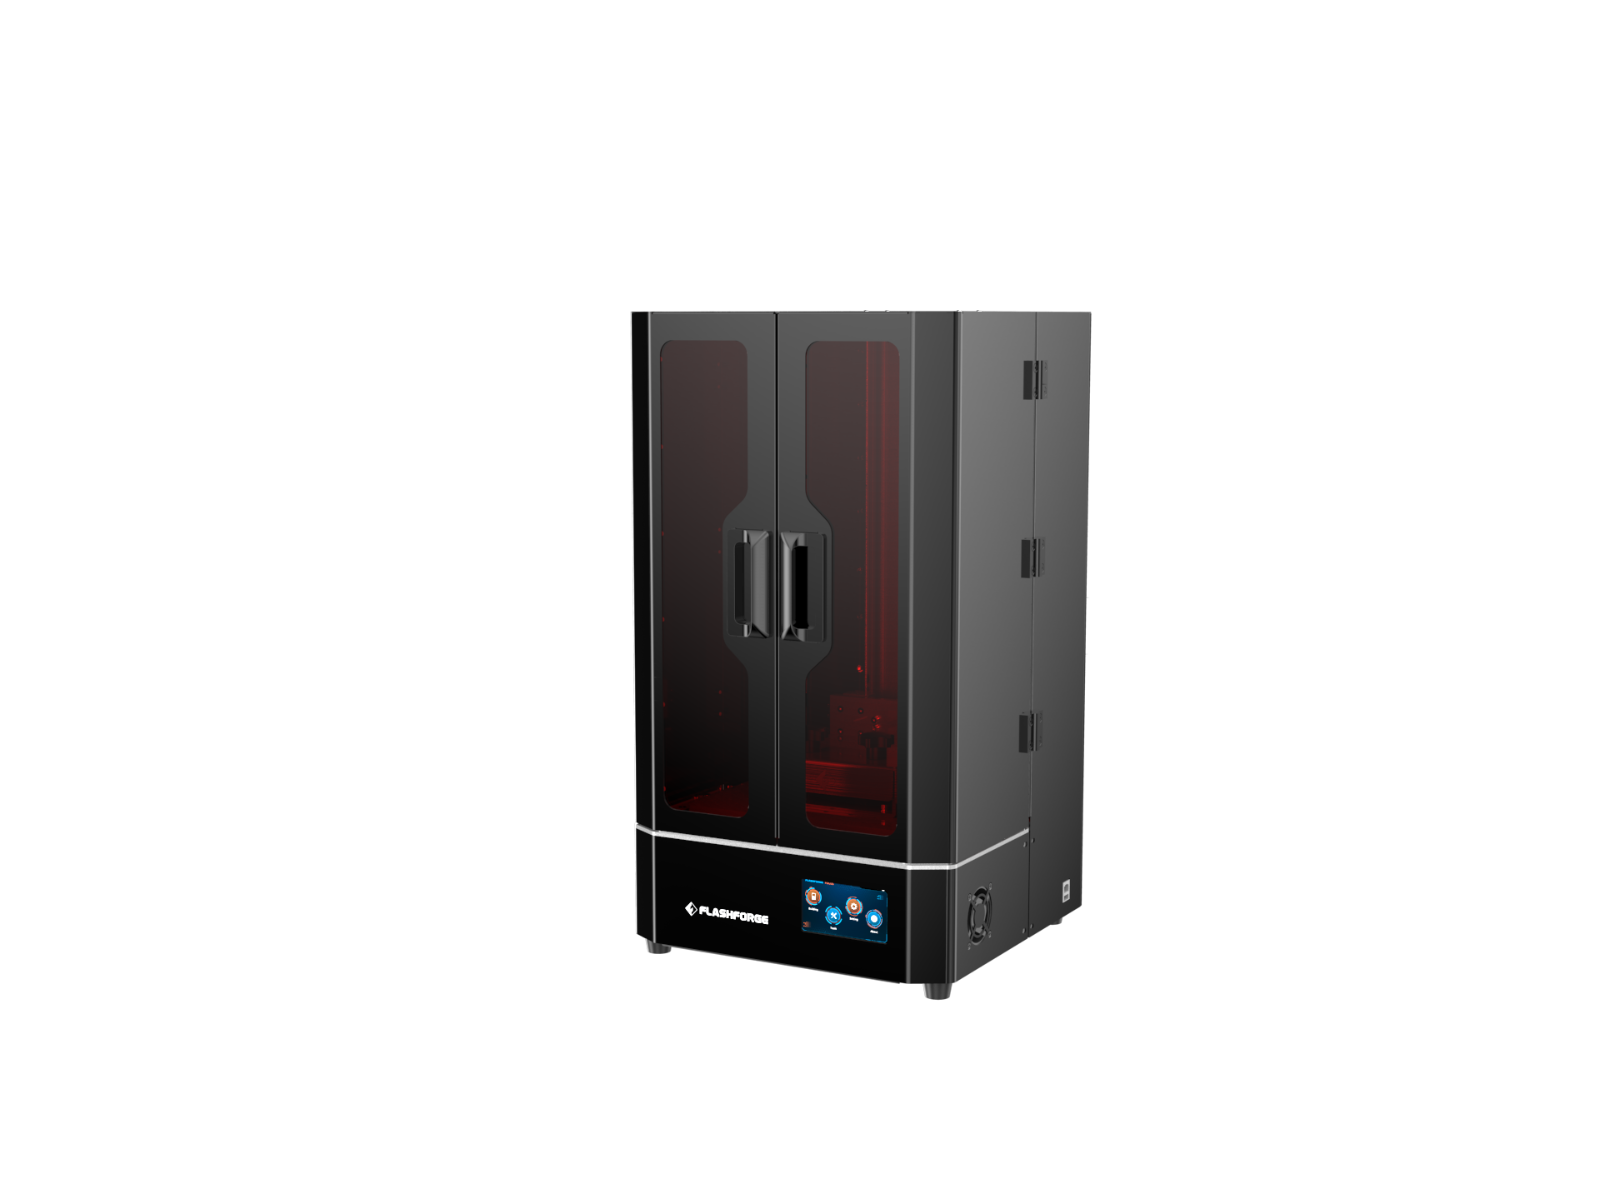 FLASHFORGE FOTO 13.3 LCD RESIN 3D-Drucker